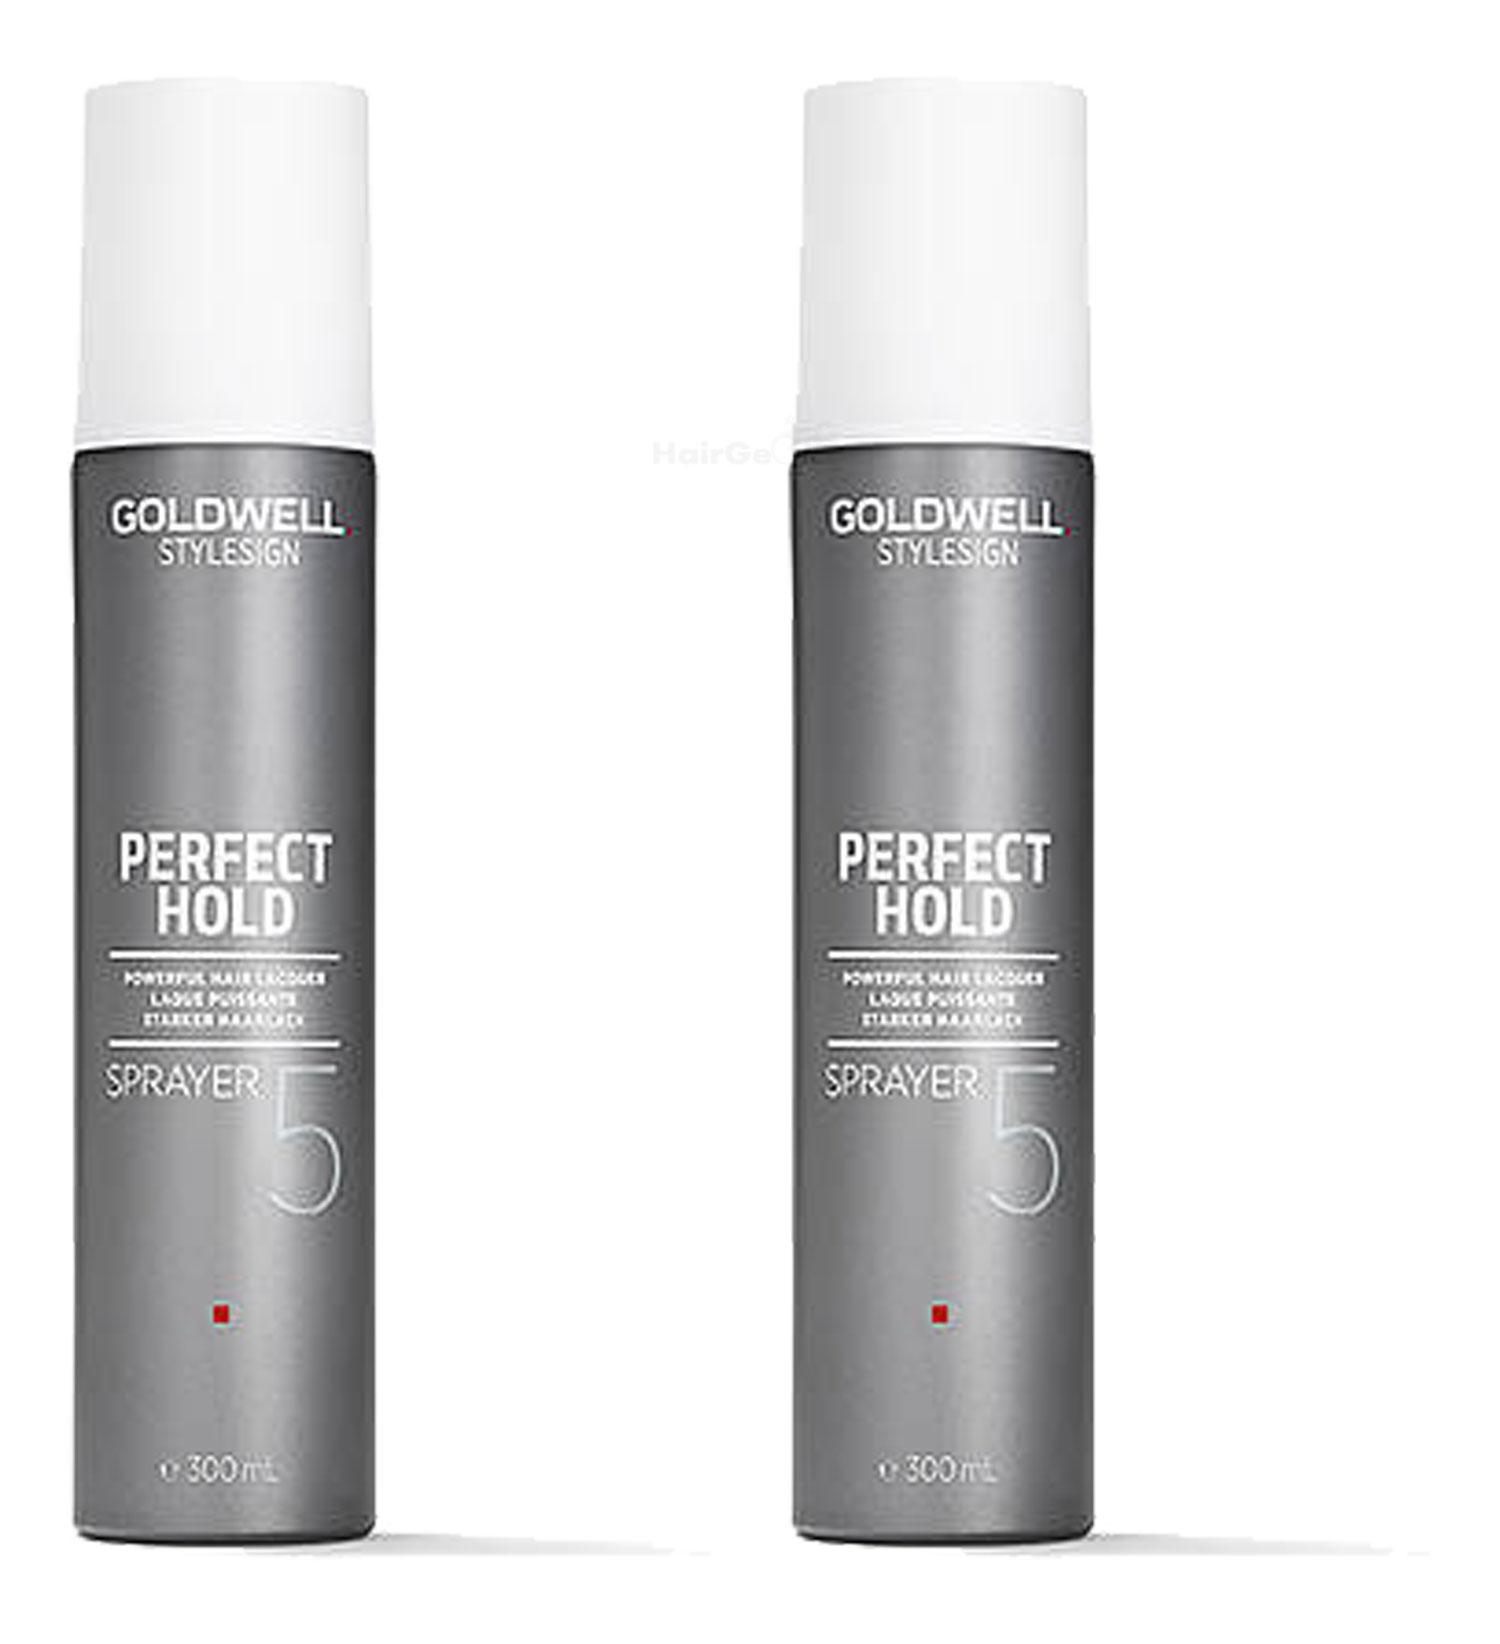 Goldwell StyleSign Perfect Hold Aktion - Sprayer 2x500ml = 1000ml